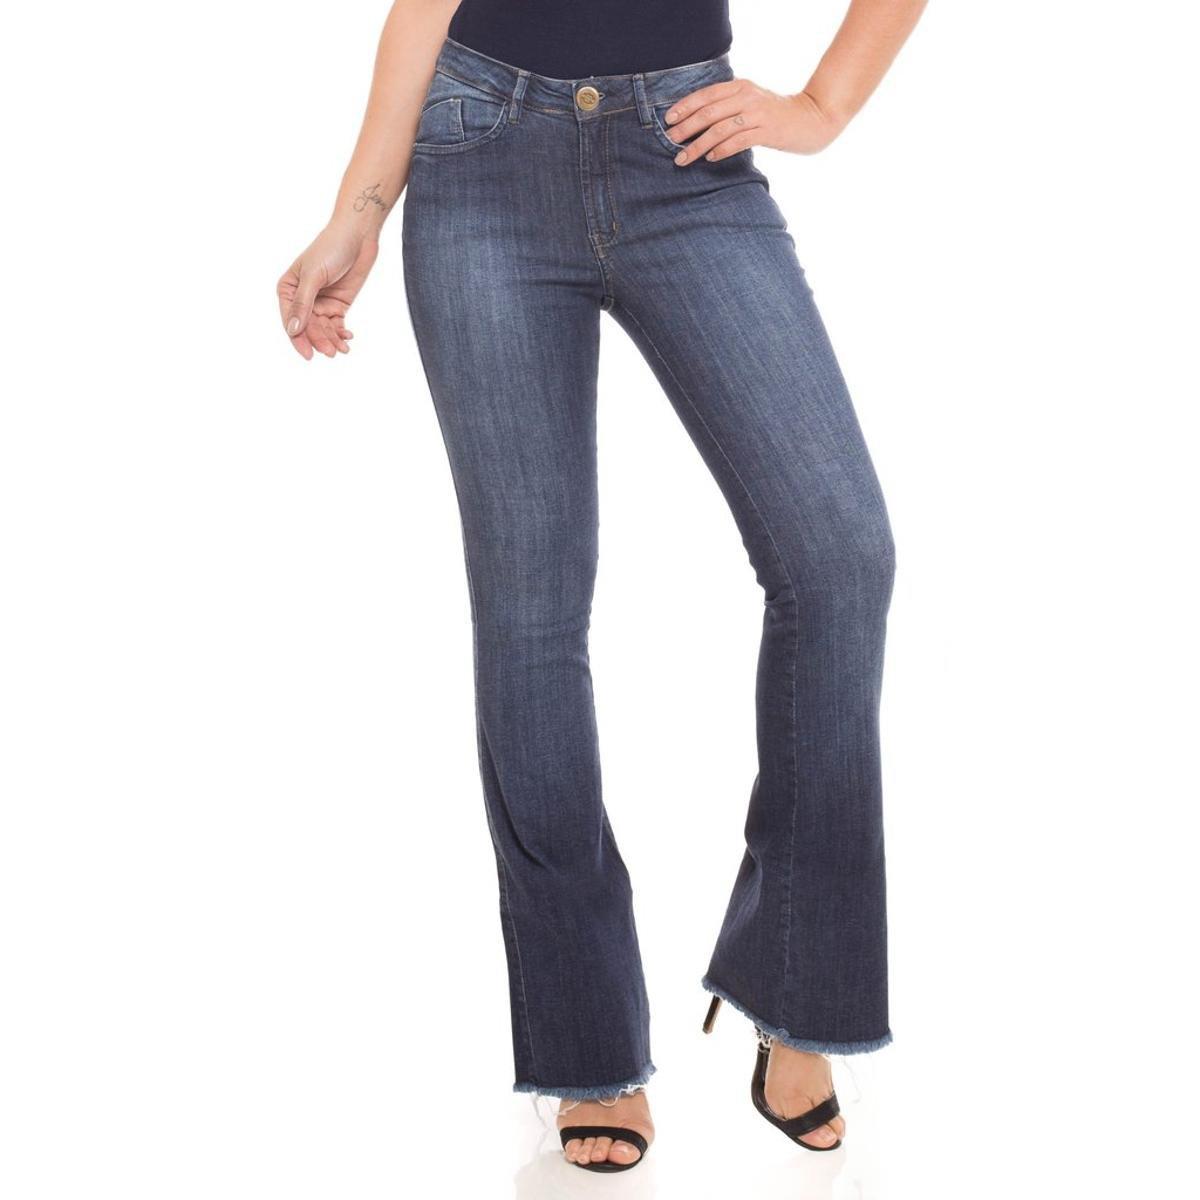 934fd4c53 Calça Jeans Mid Rise Flare Low Denúncia Feminina - Compre Agora ...